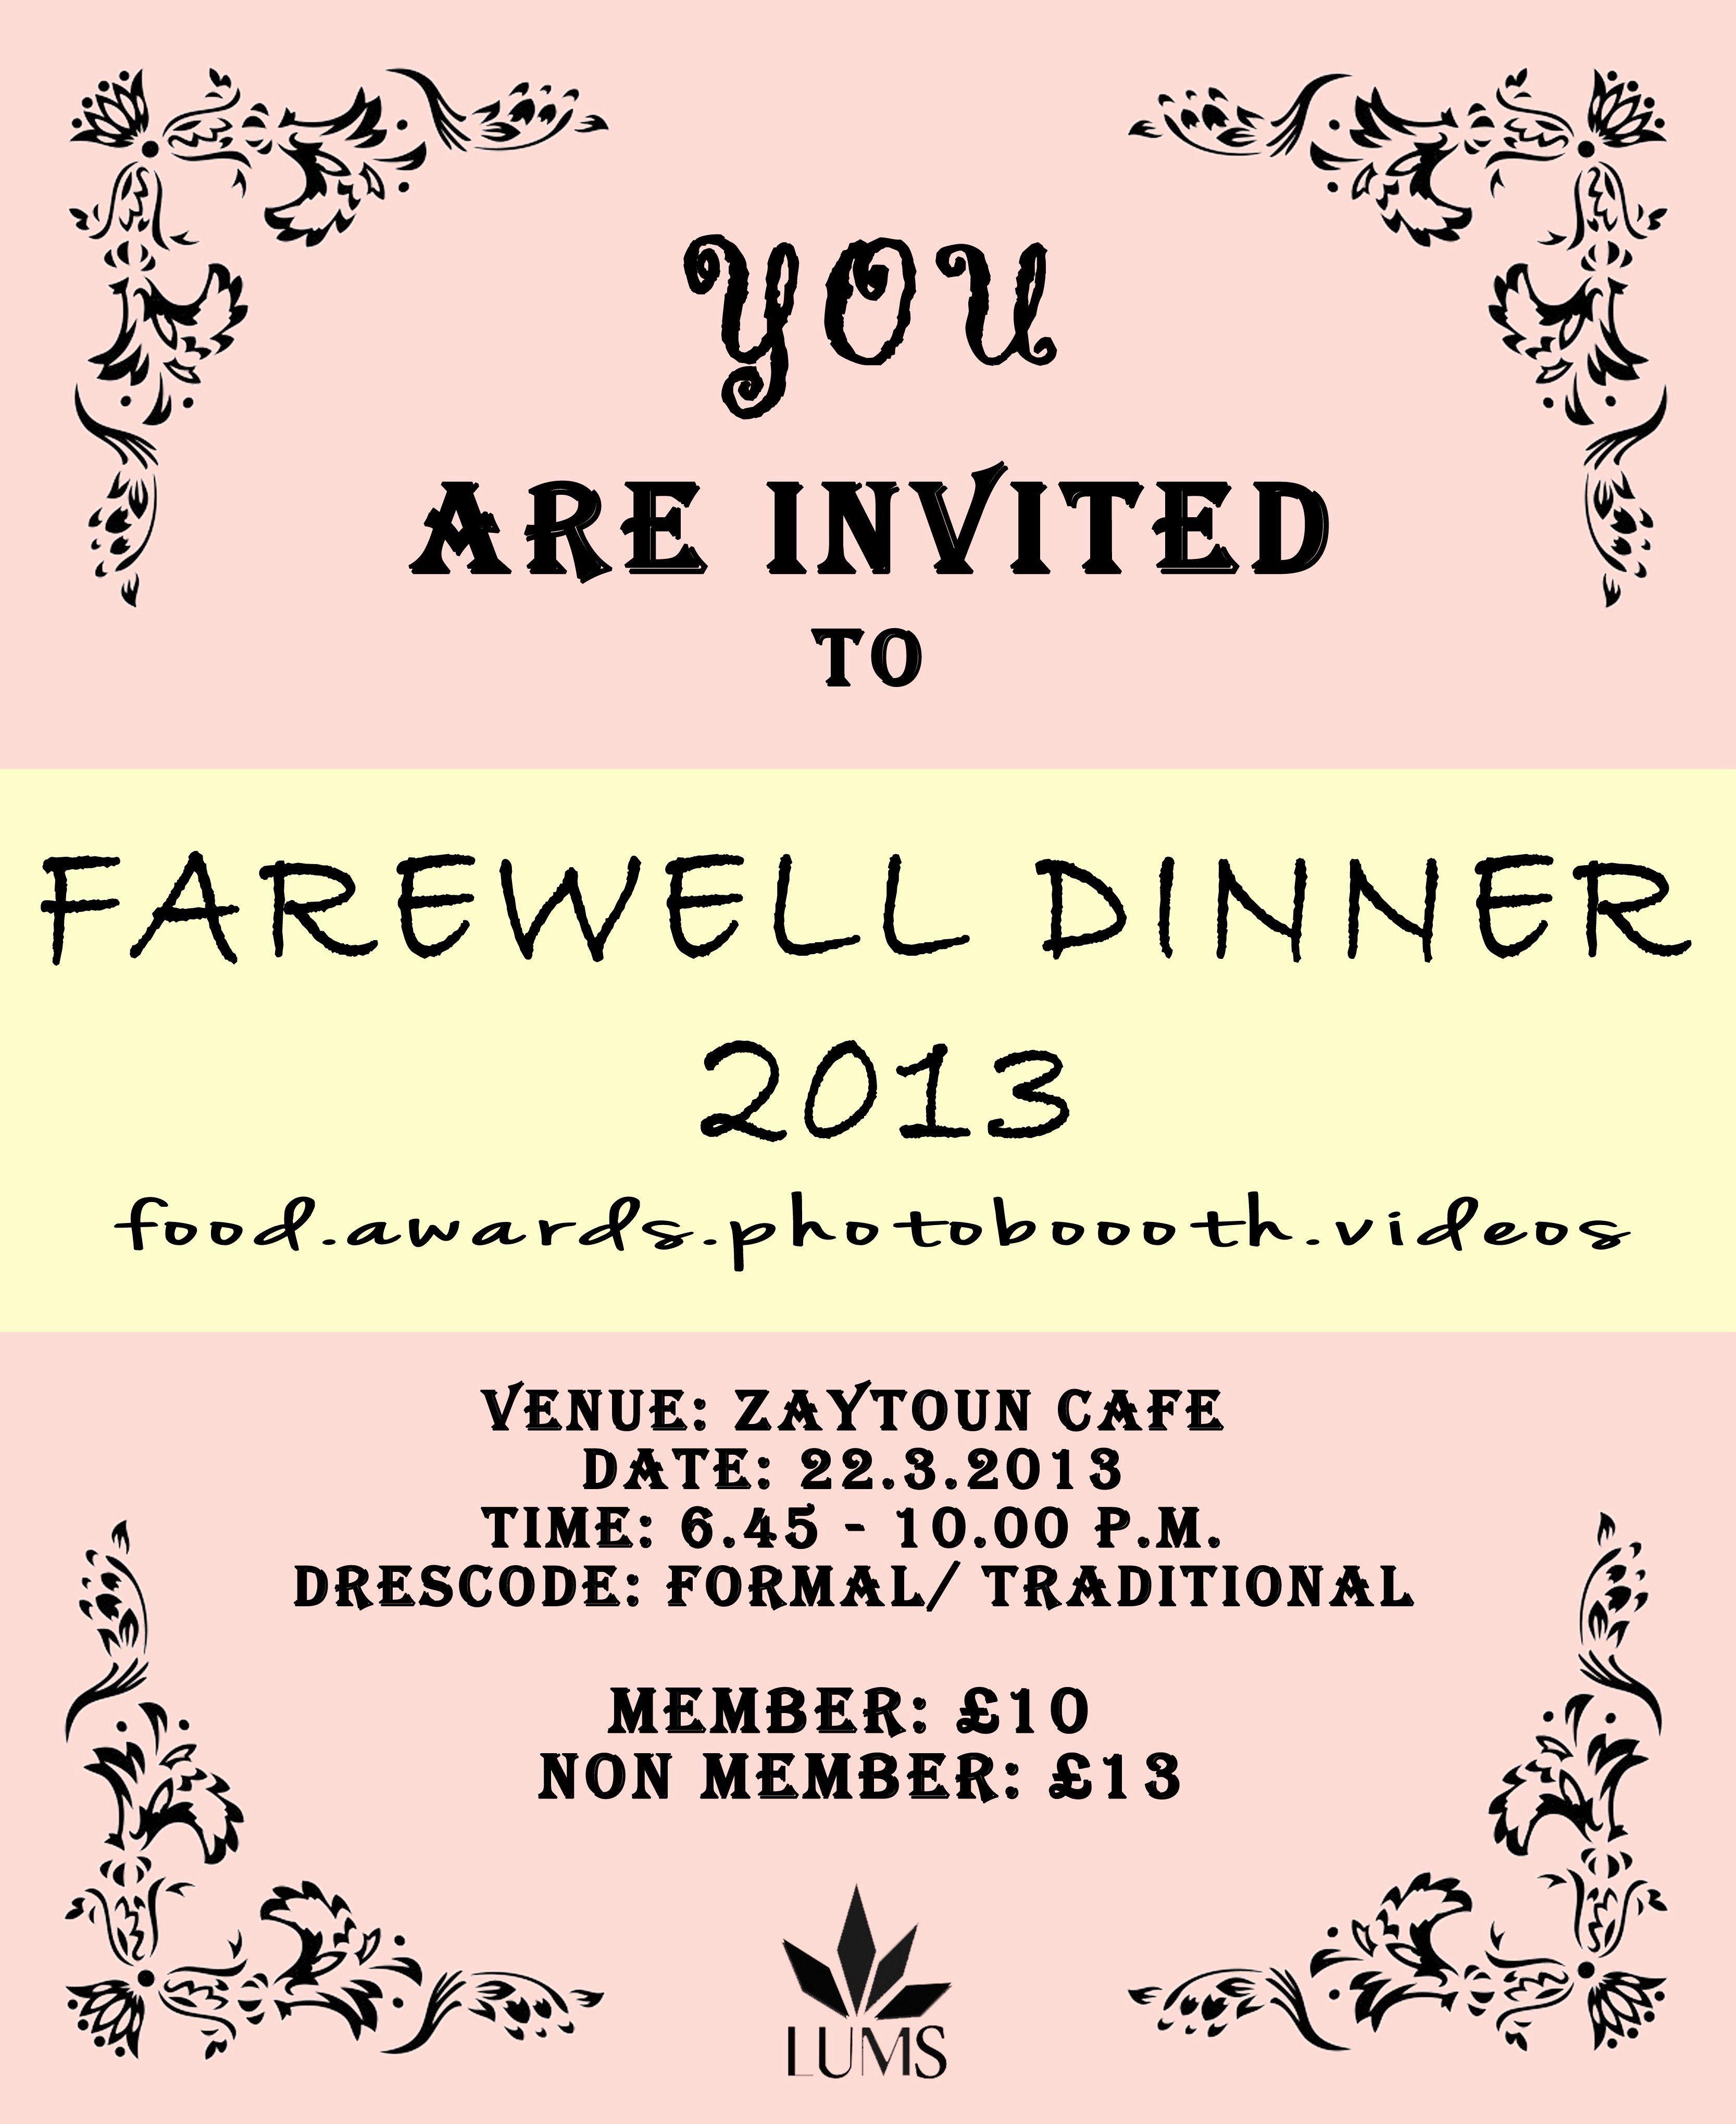 Free Printable Goodbye Cards Inspirational Going Away Invitation